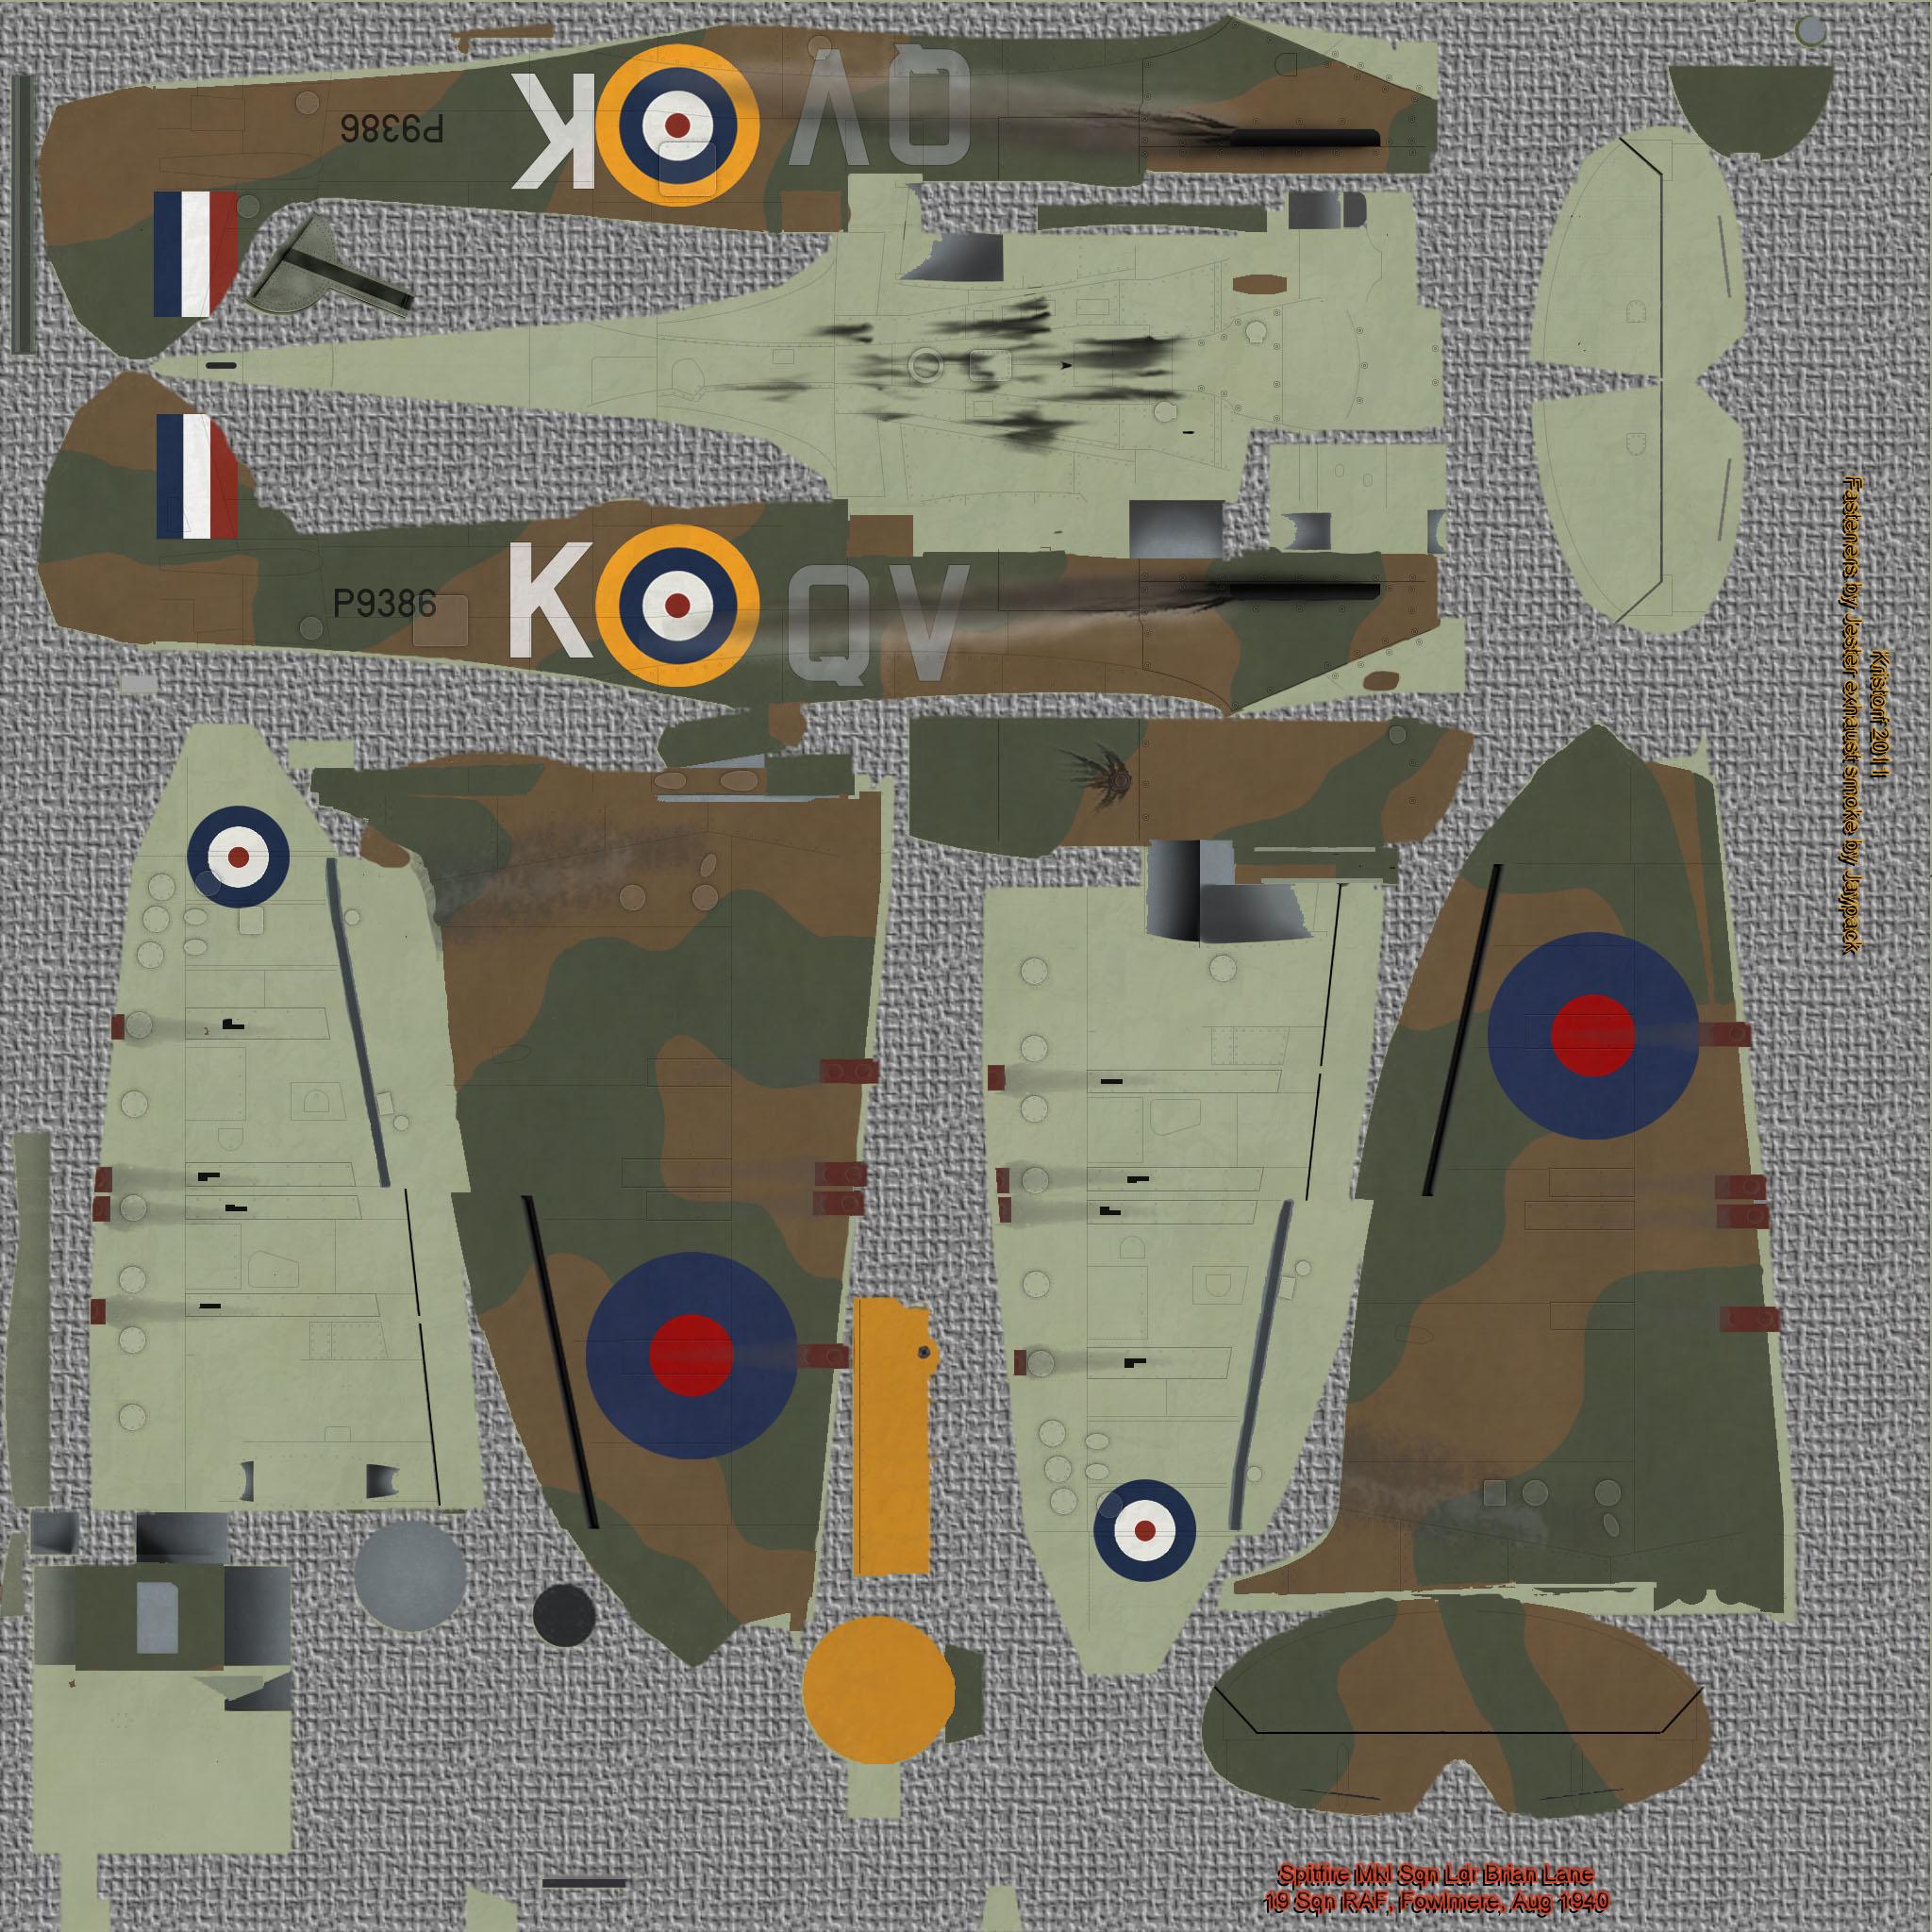 COD KF MkI RAF 19Sqn QVK Brian Lane Battle of Britain Fowlmere 1940